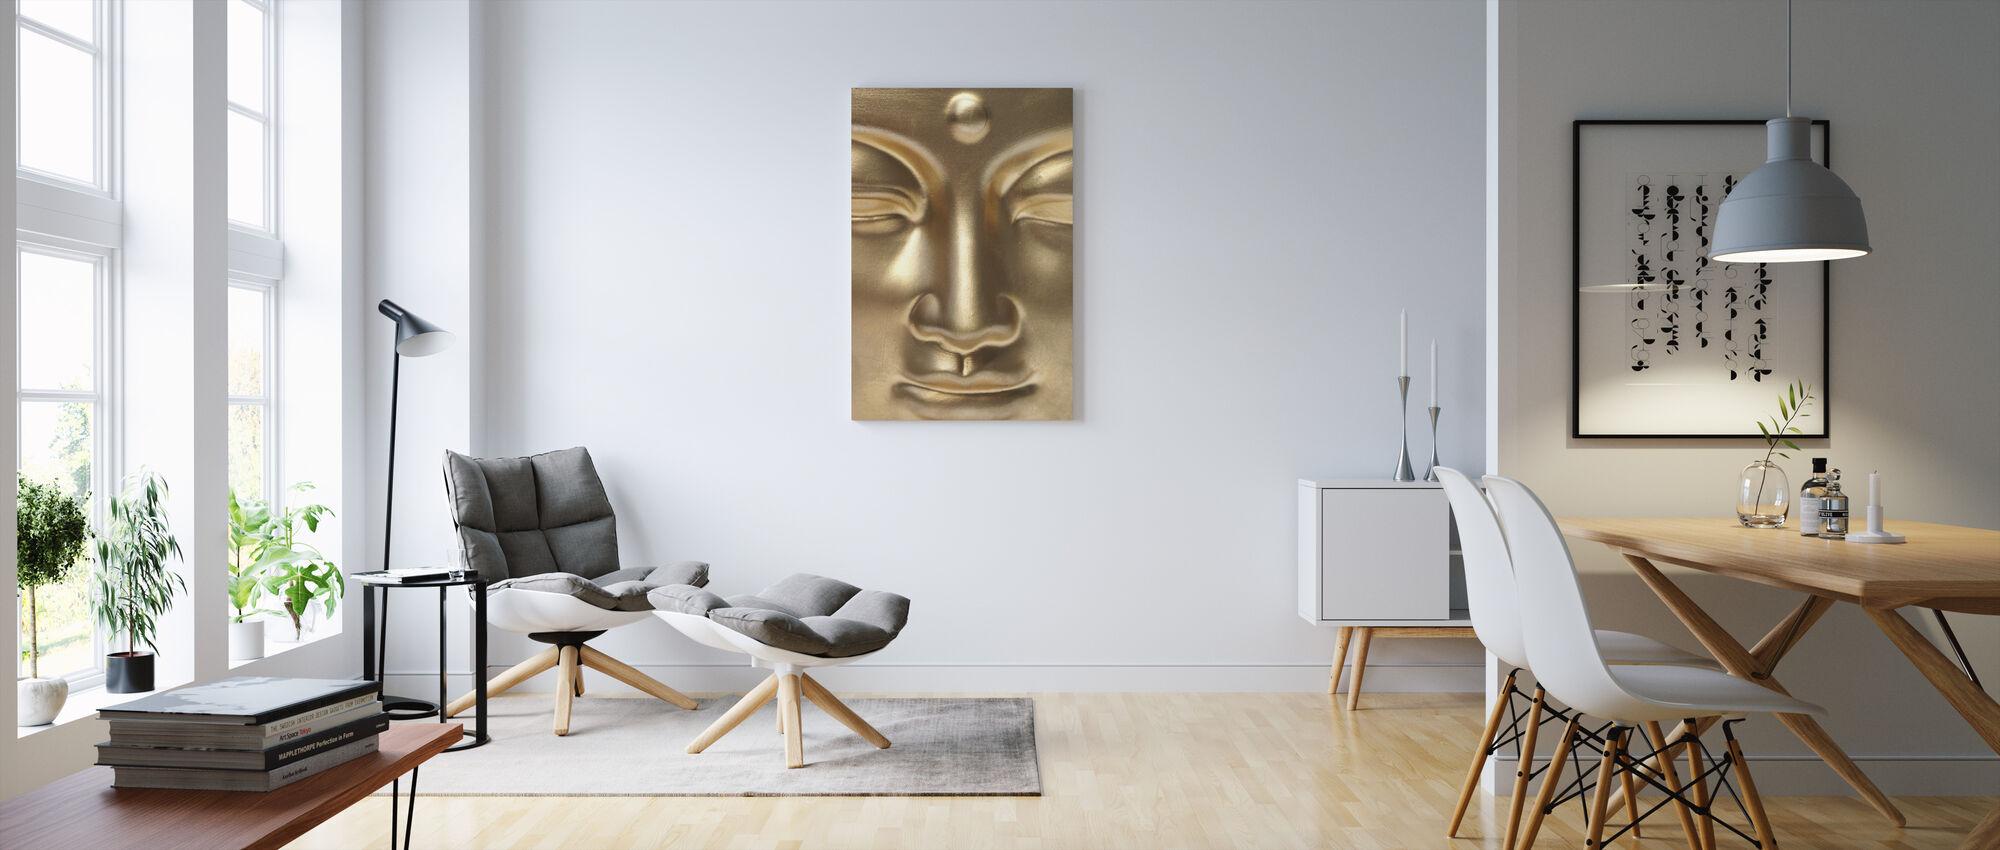 Golden Buddha Close Up - Canvas print - Living Room